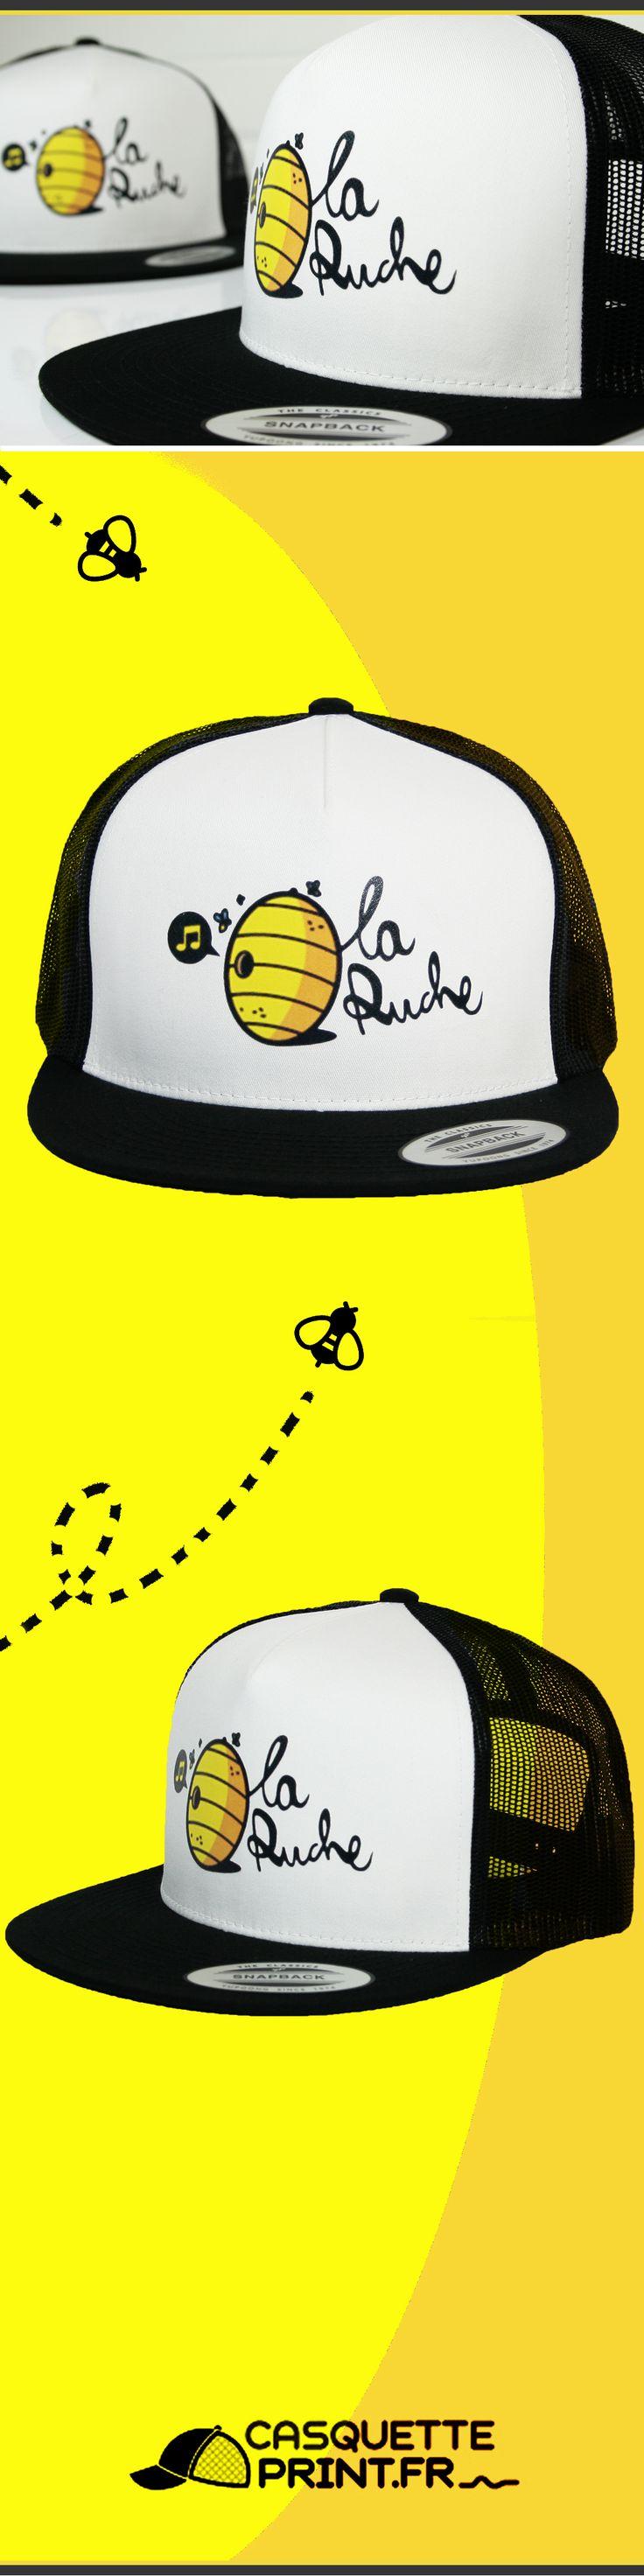 #casquette #personnaliser #yupoong #trucker #bonnet #personnalisation #snapback #fashion #mode #goodies #associations #entreprises #particuliers